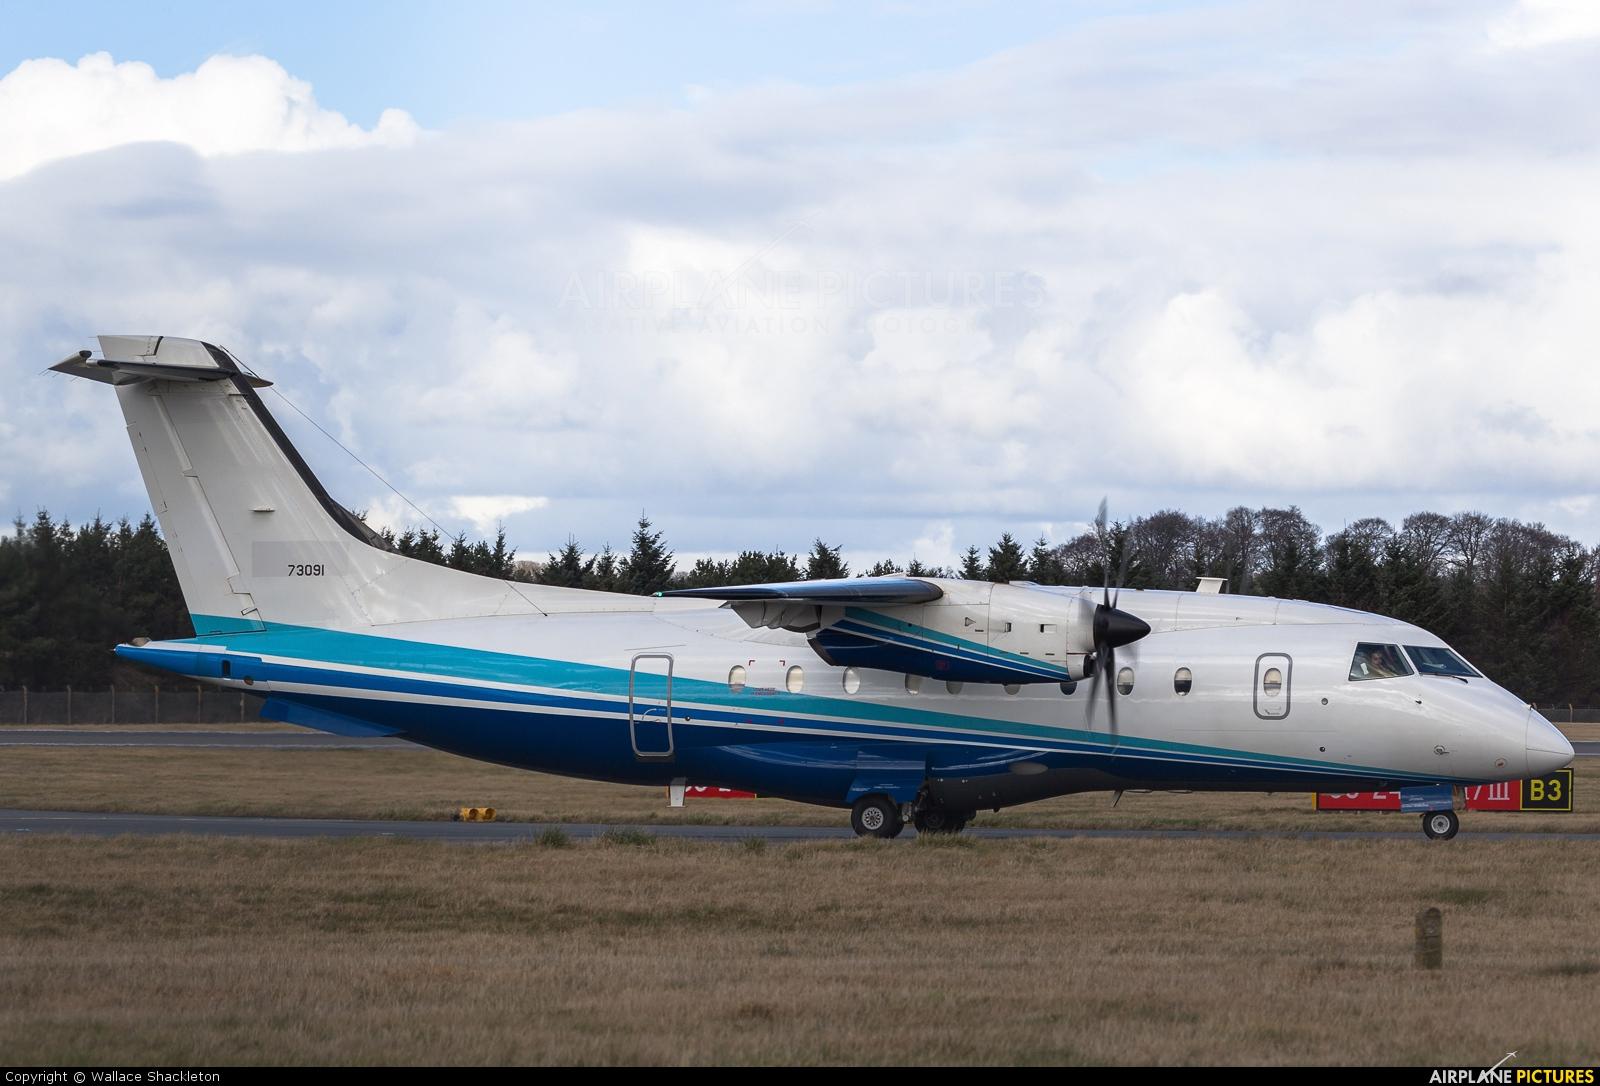 USA - Air Force 97-3091 aircraft at Edinburgh